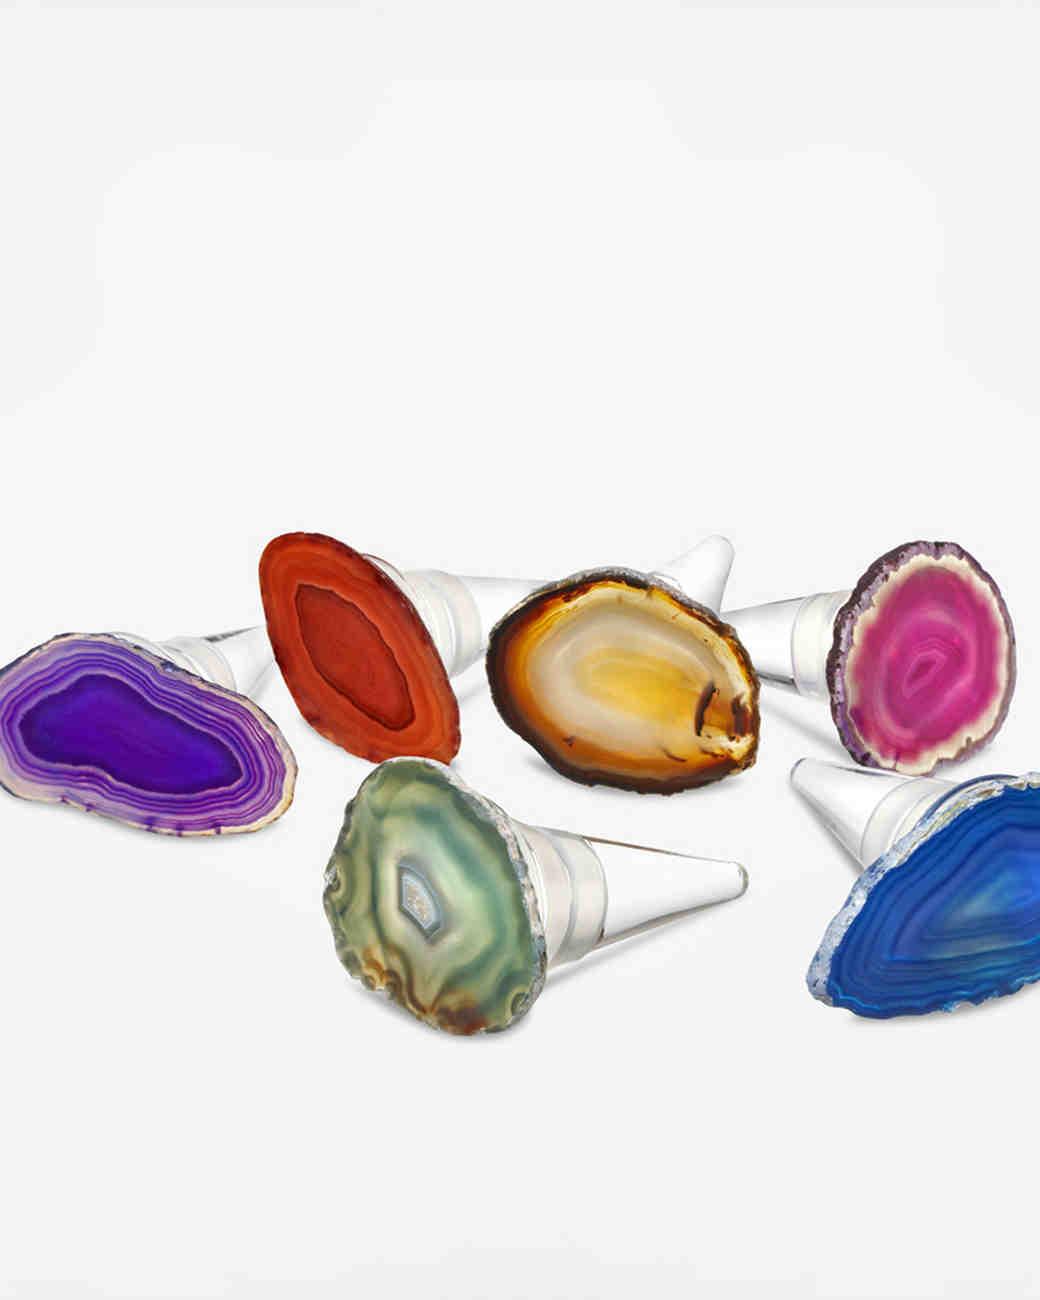 zola-registry-anna-rablabs-garra-multicolored-bottle-stoppers-0716.jpg